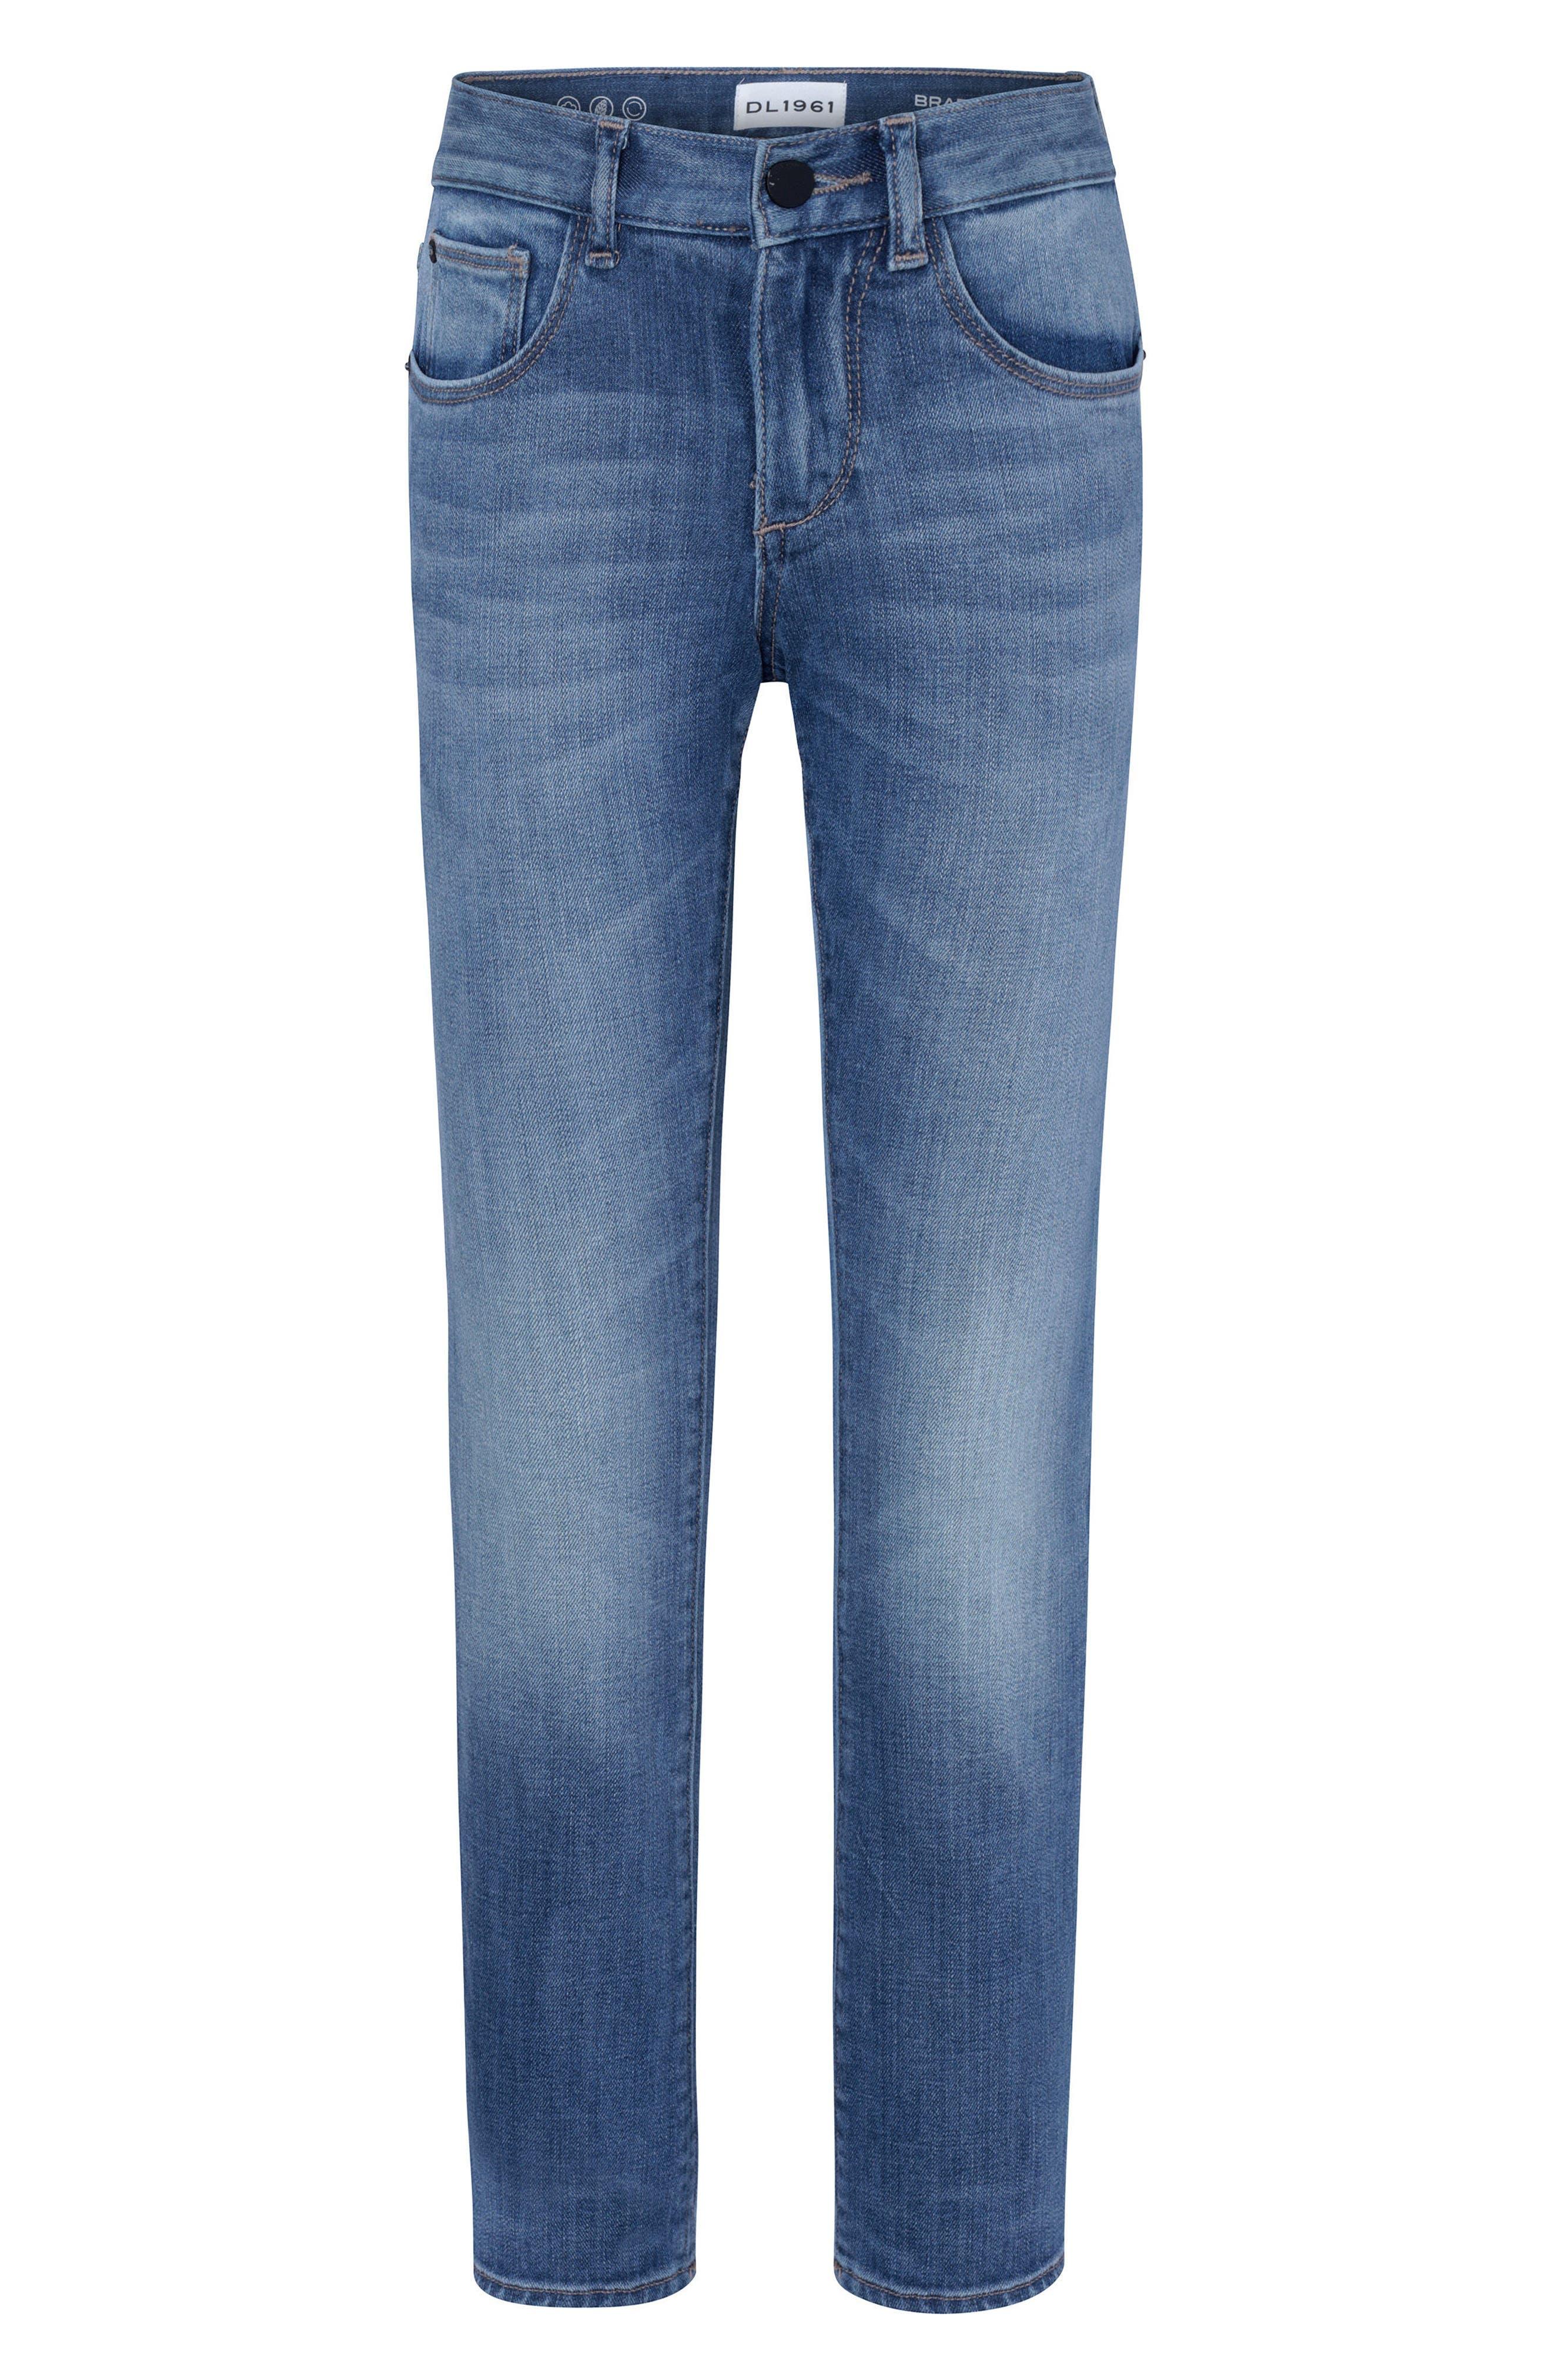 Brady Slim Fit Jeans,                         Main,                         color, FRESH